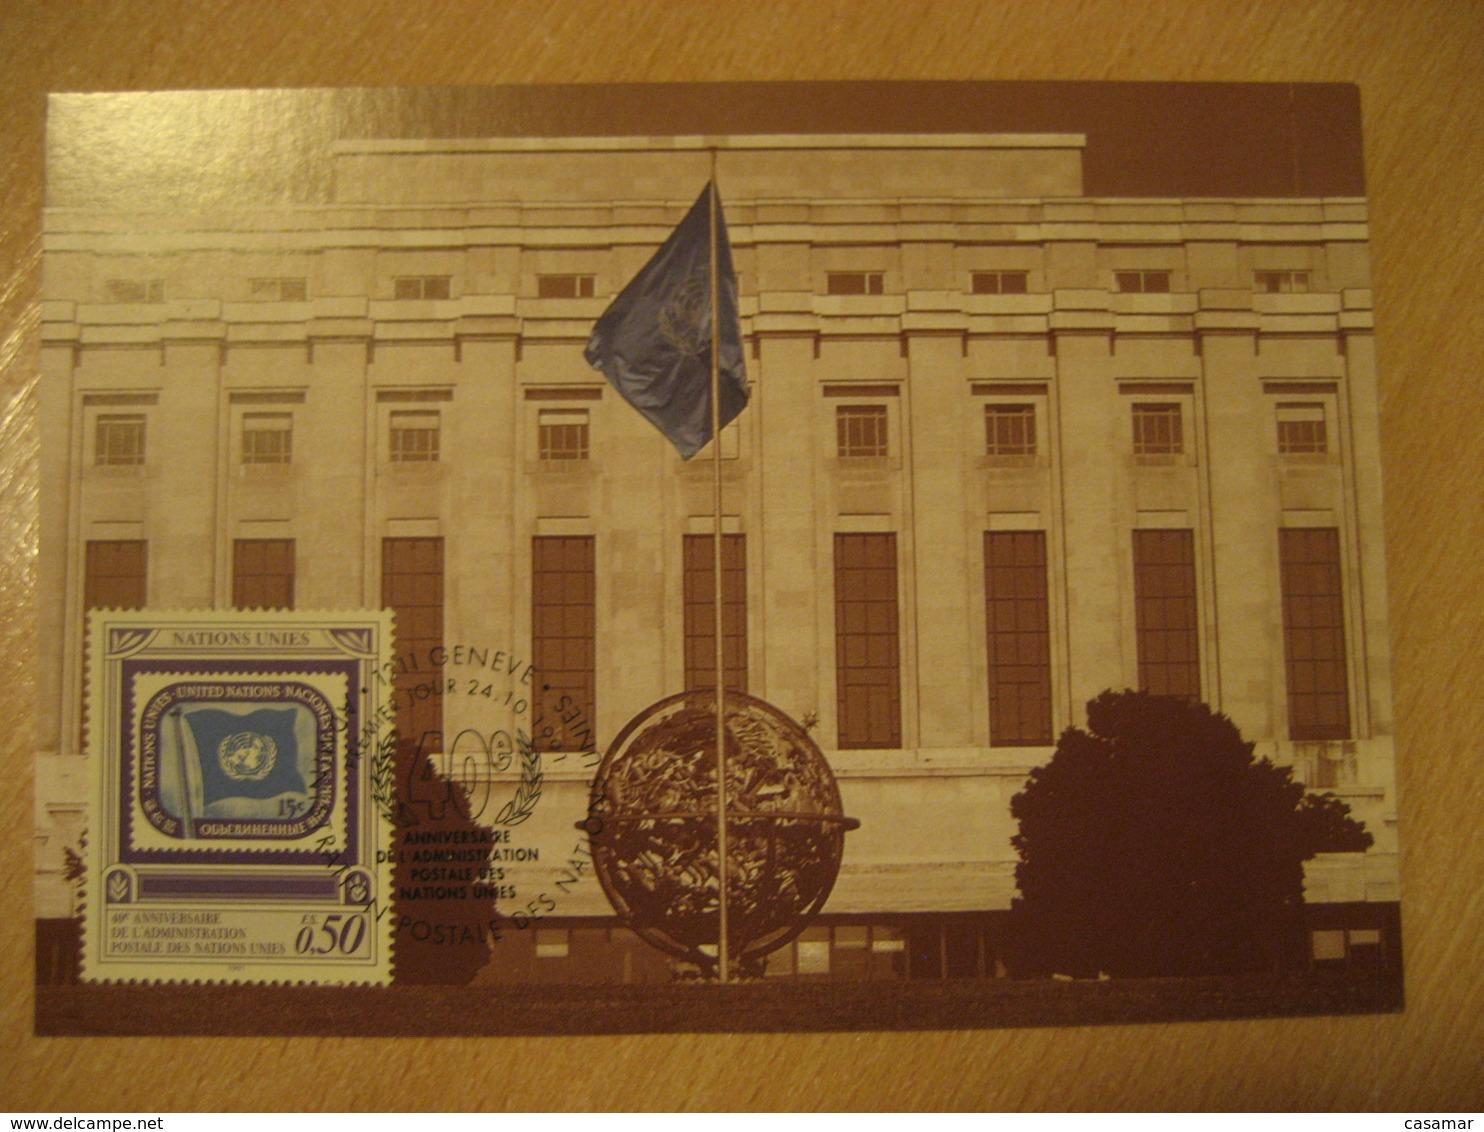 GENEVE 1991 40th Anniversary Flag Flags Maxi Maximum Card Switzerland UNITED NATIONS - Briefe